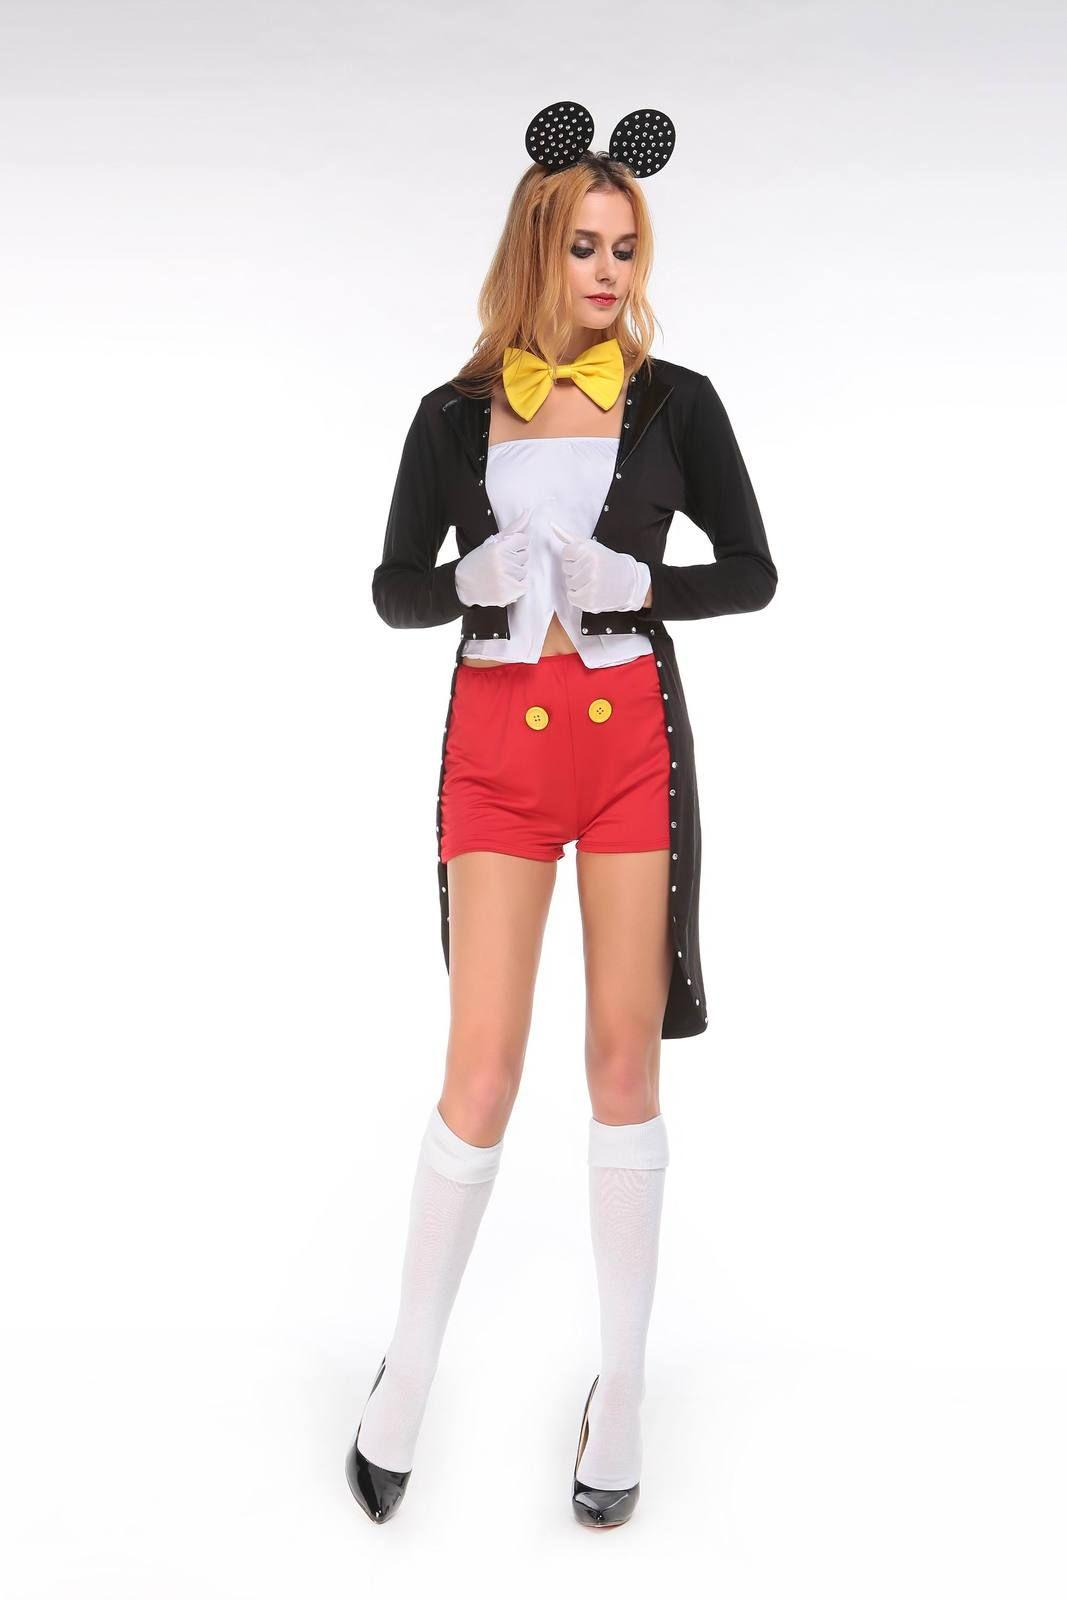 Mickey Mouse Halloween costume   Pinterest   Mickey mouse halloween ...